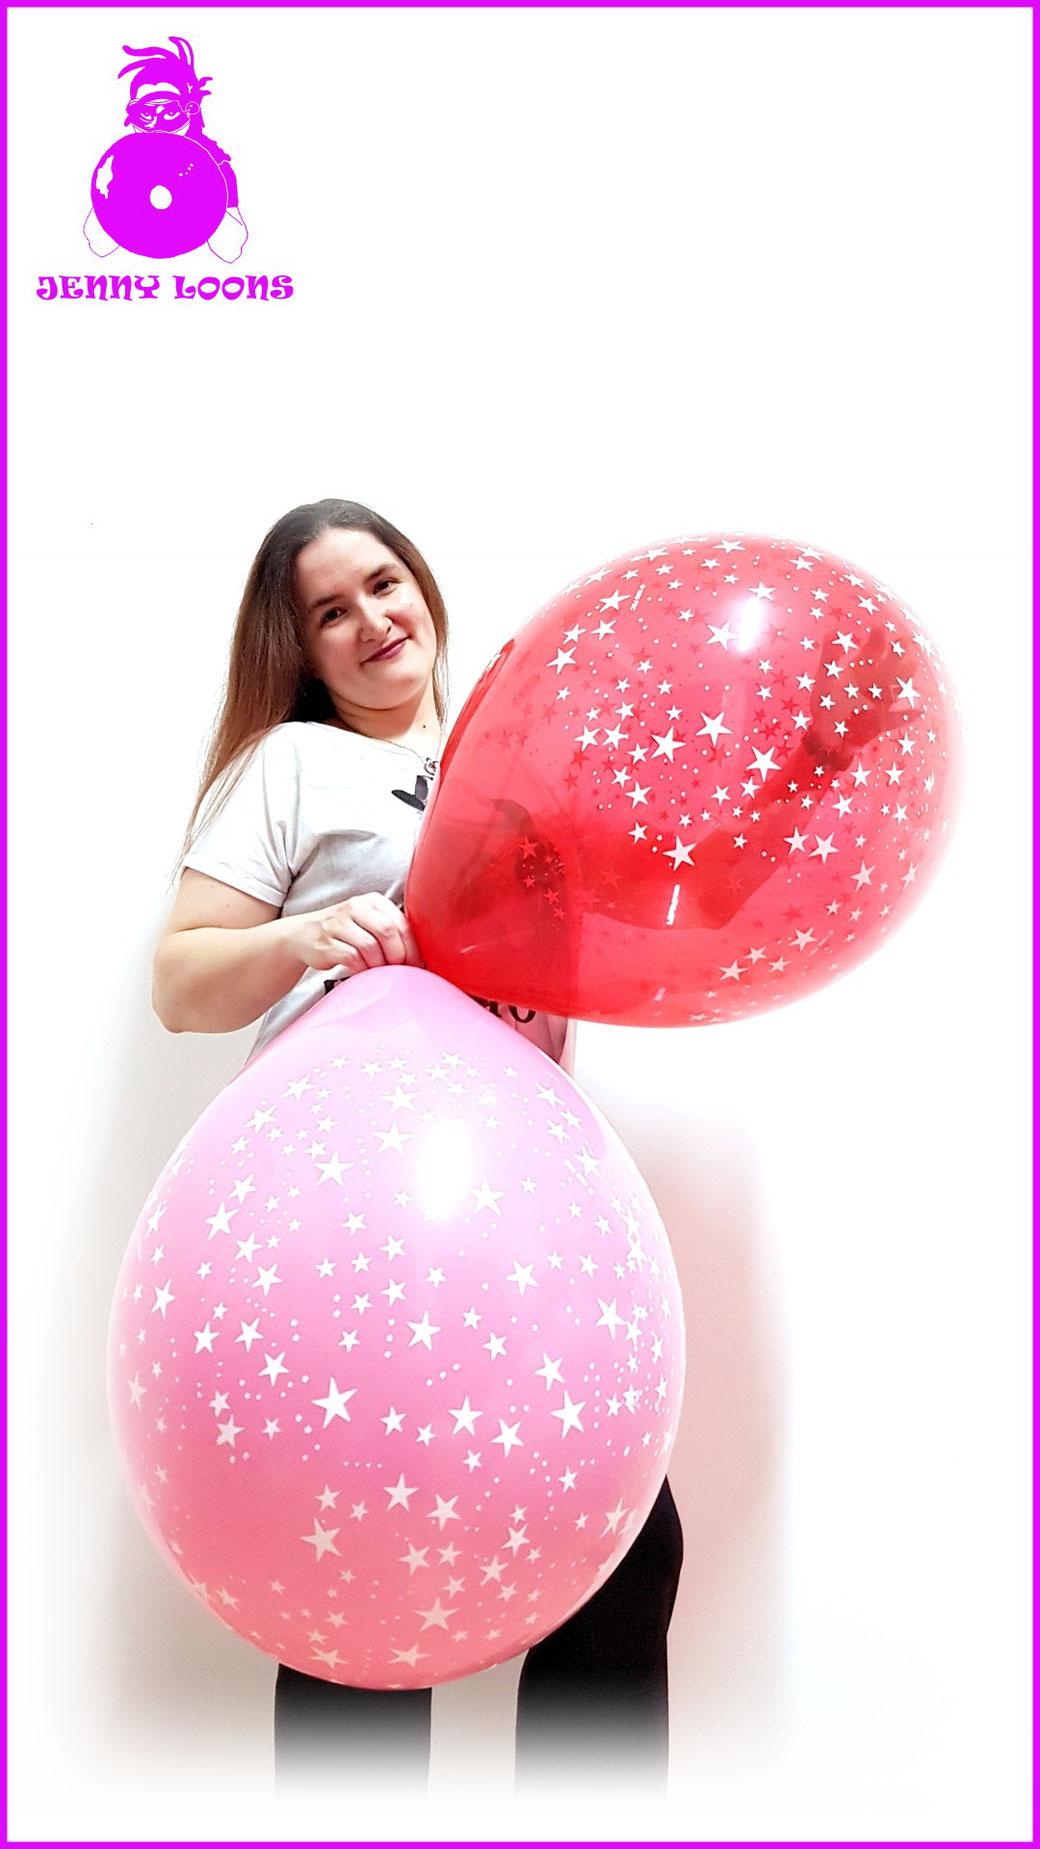 Qualatex Luftballon Ballon Stars Sterne 16inch 40cm kristall crystal rot red blau blue green gelb yellow orange rosa rose pink grün Balloon Balloons